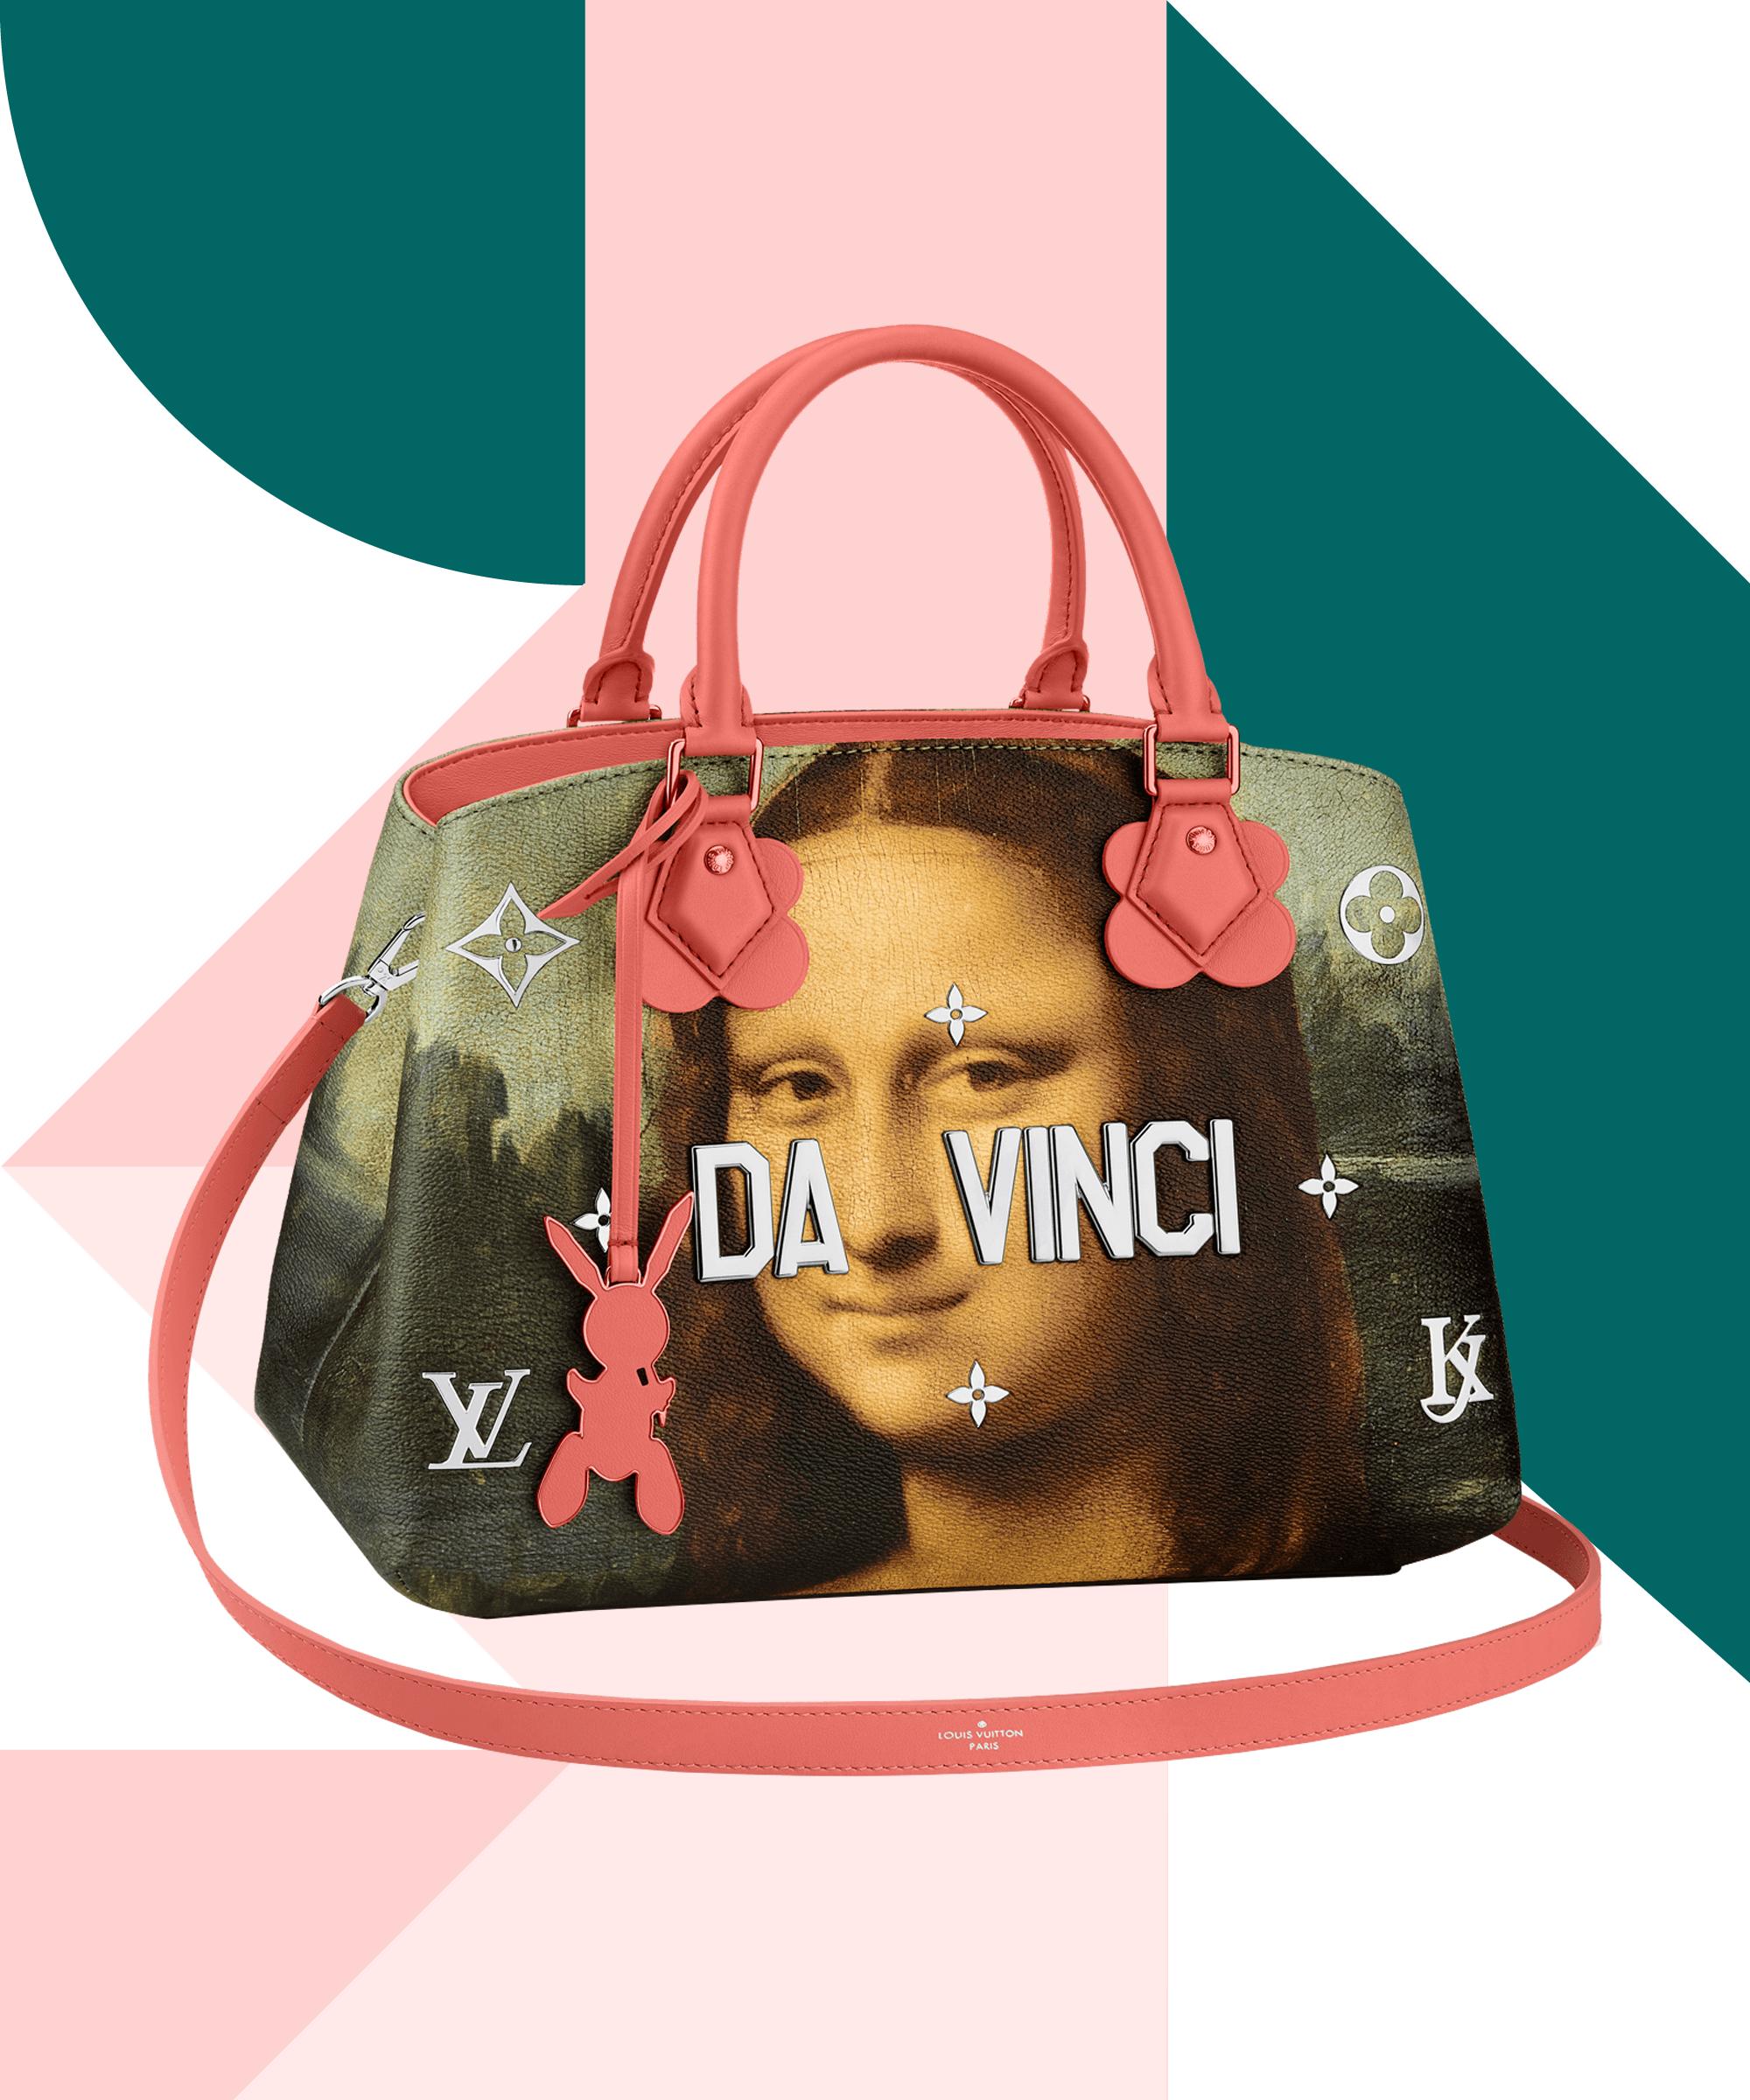 Louis vuitton jeff koons collaboration handbags for Louis vuitton bin bags